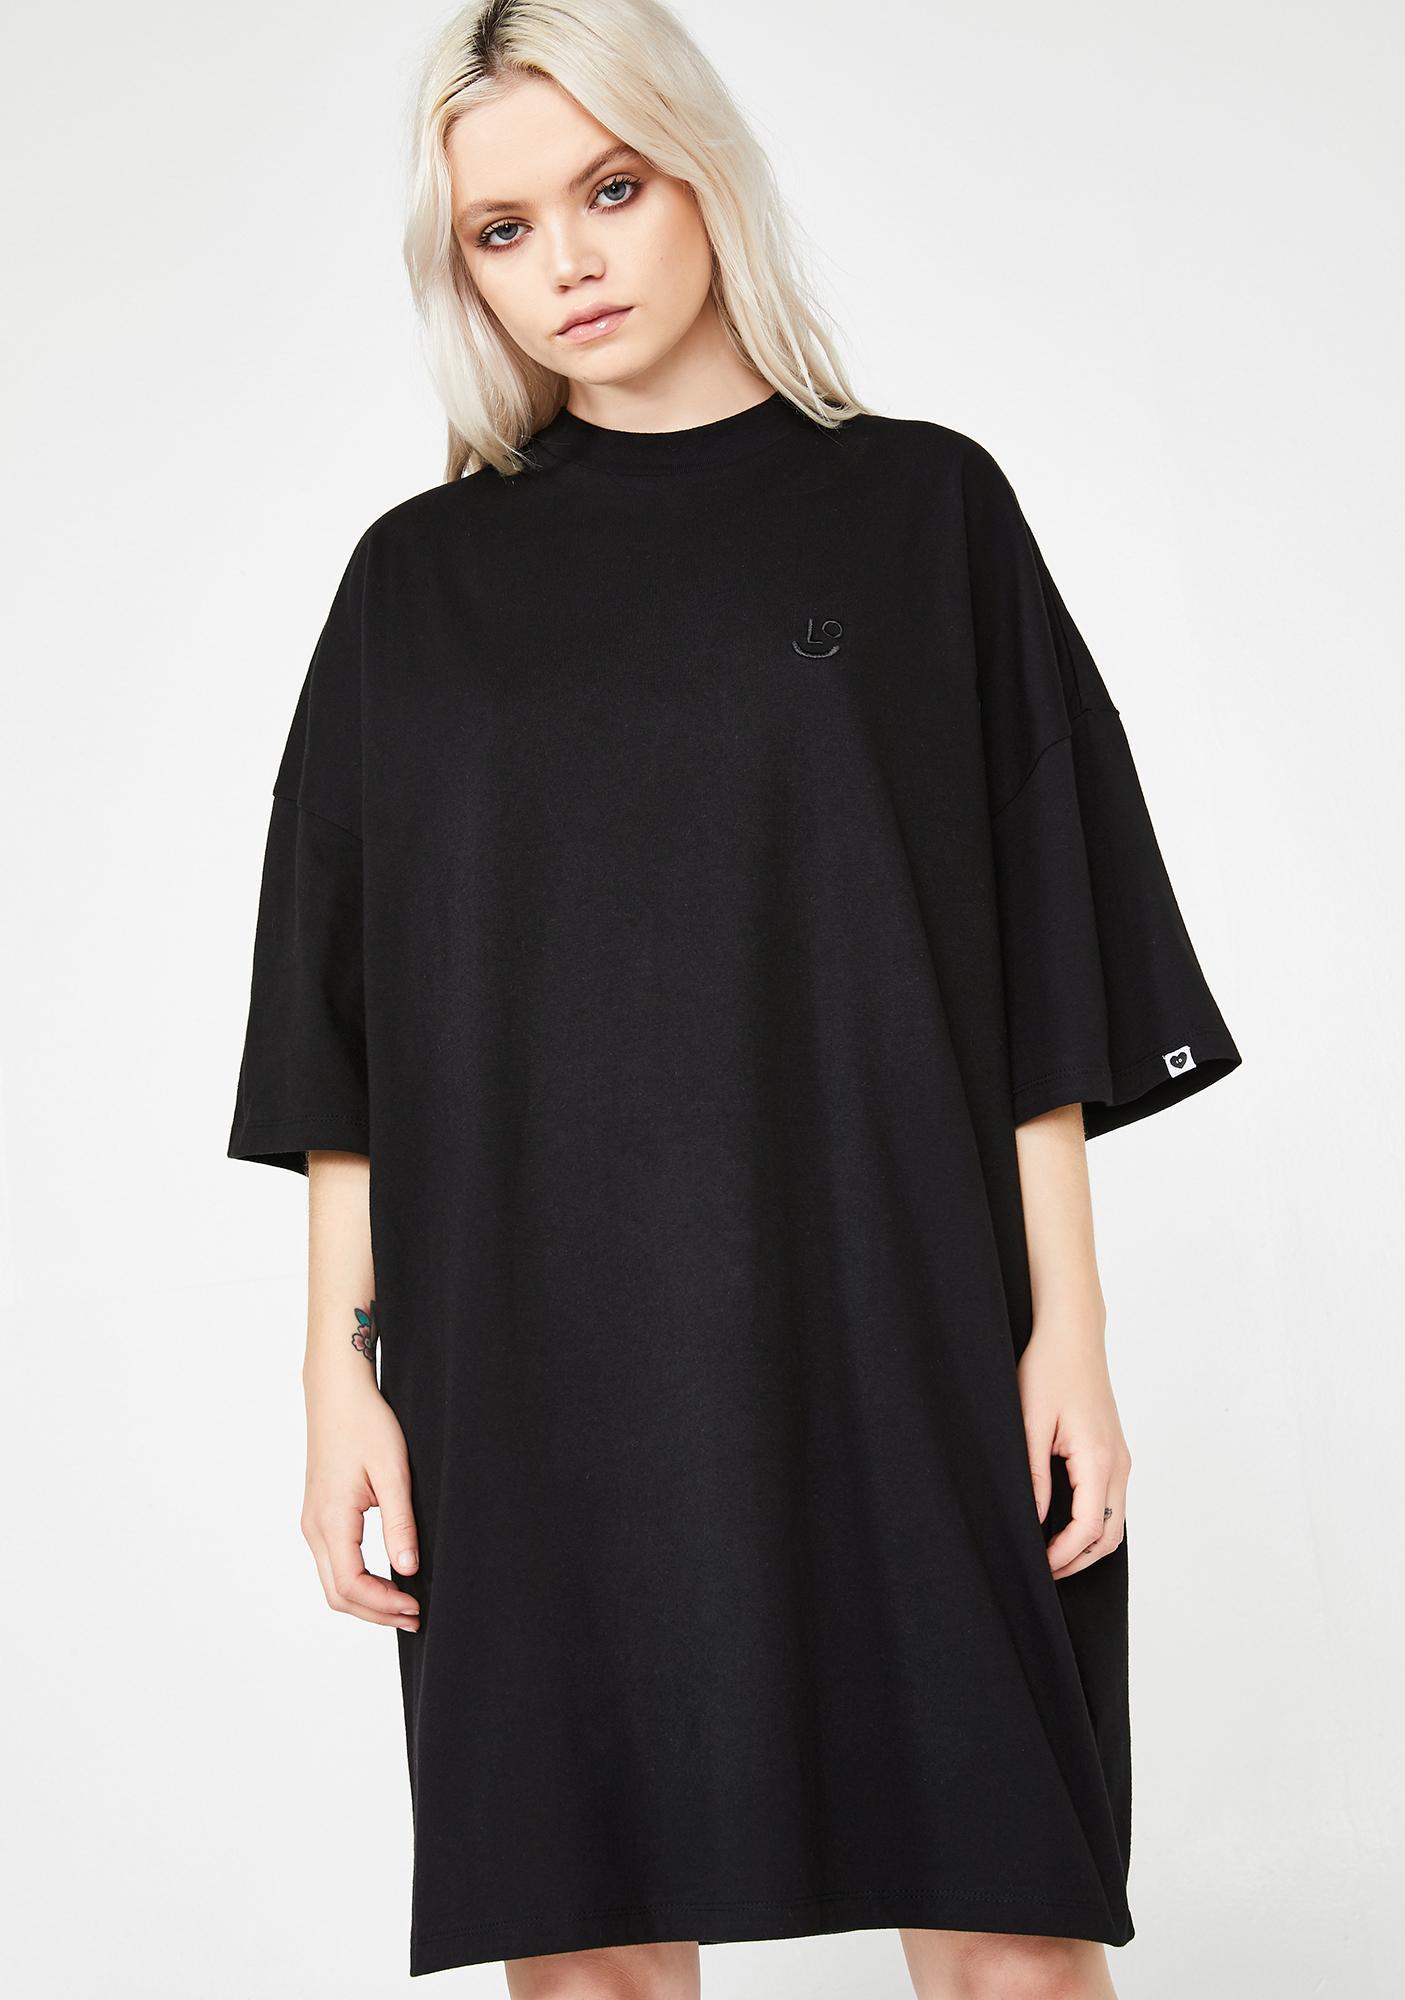 Lazy Oaf LO Black Midnight Dress